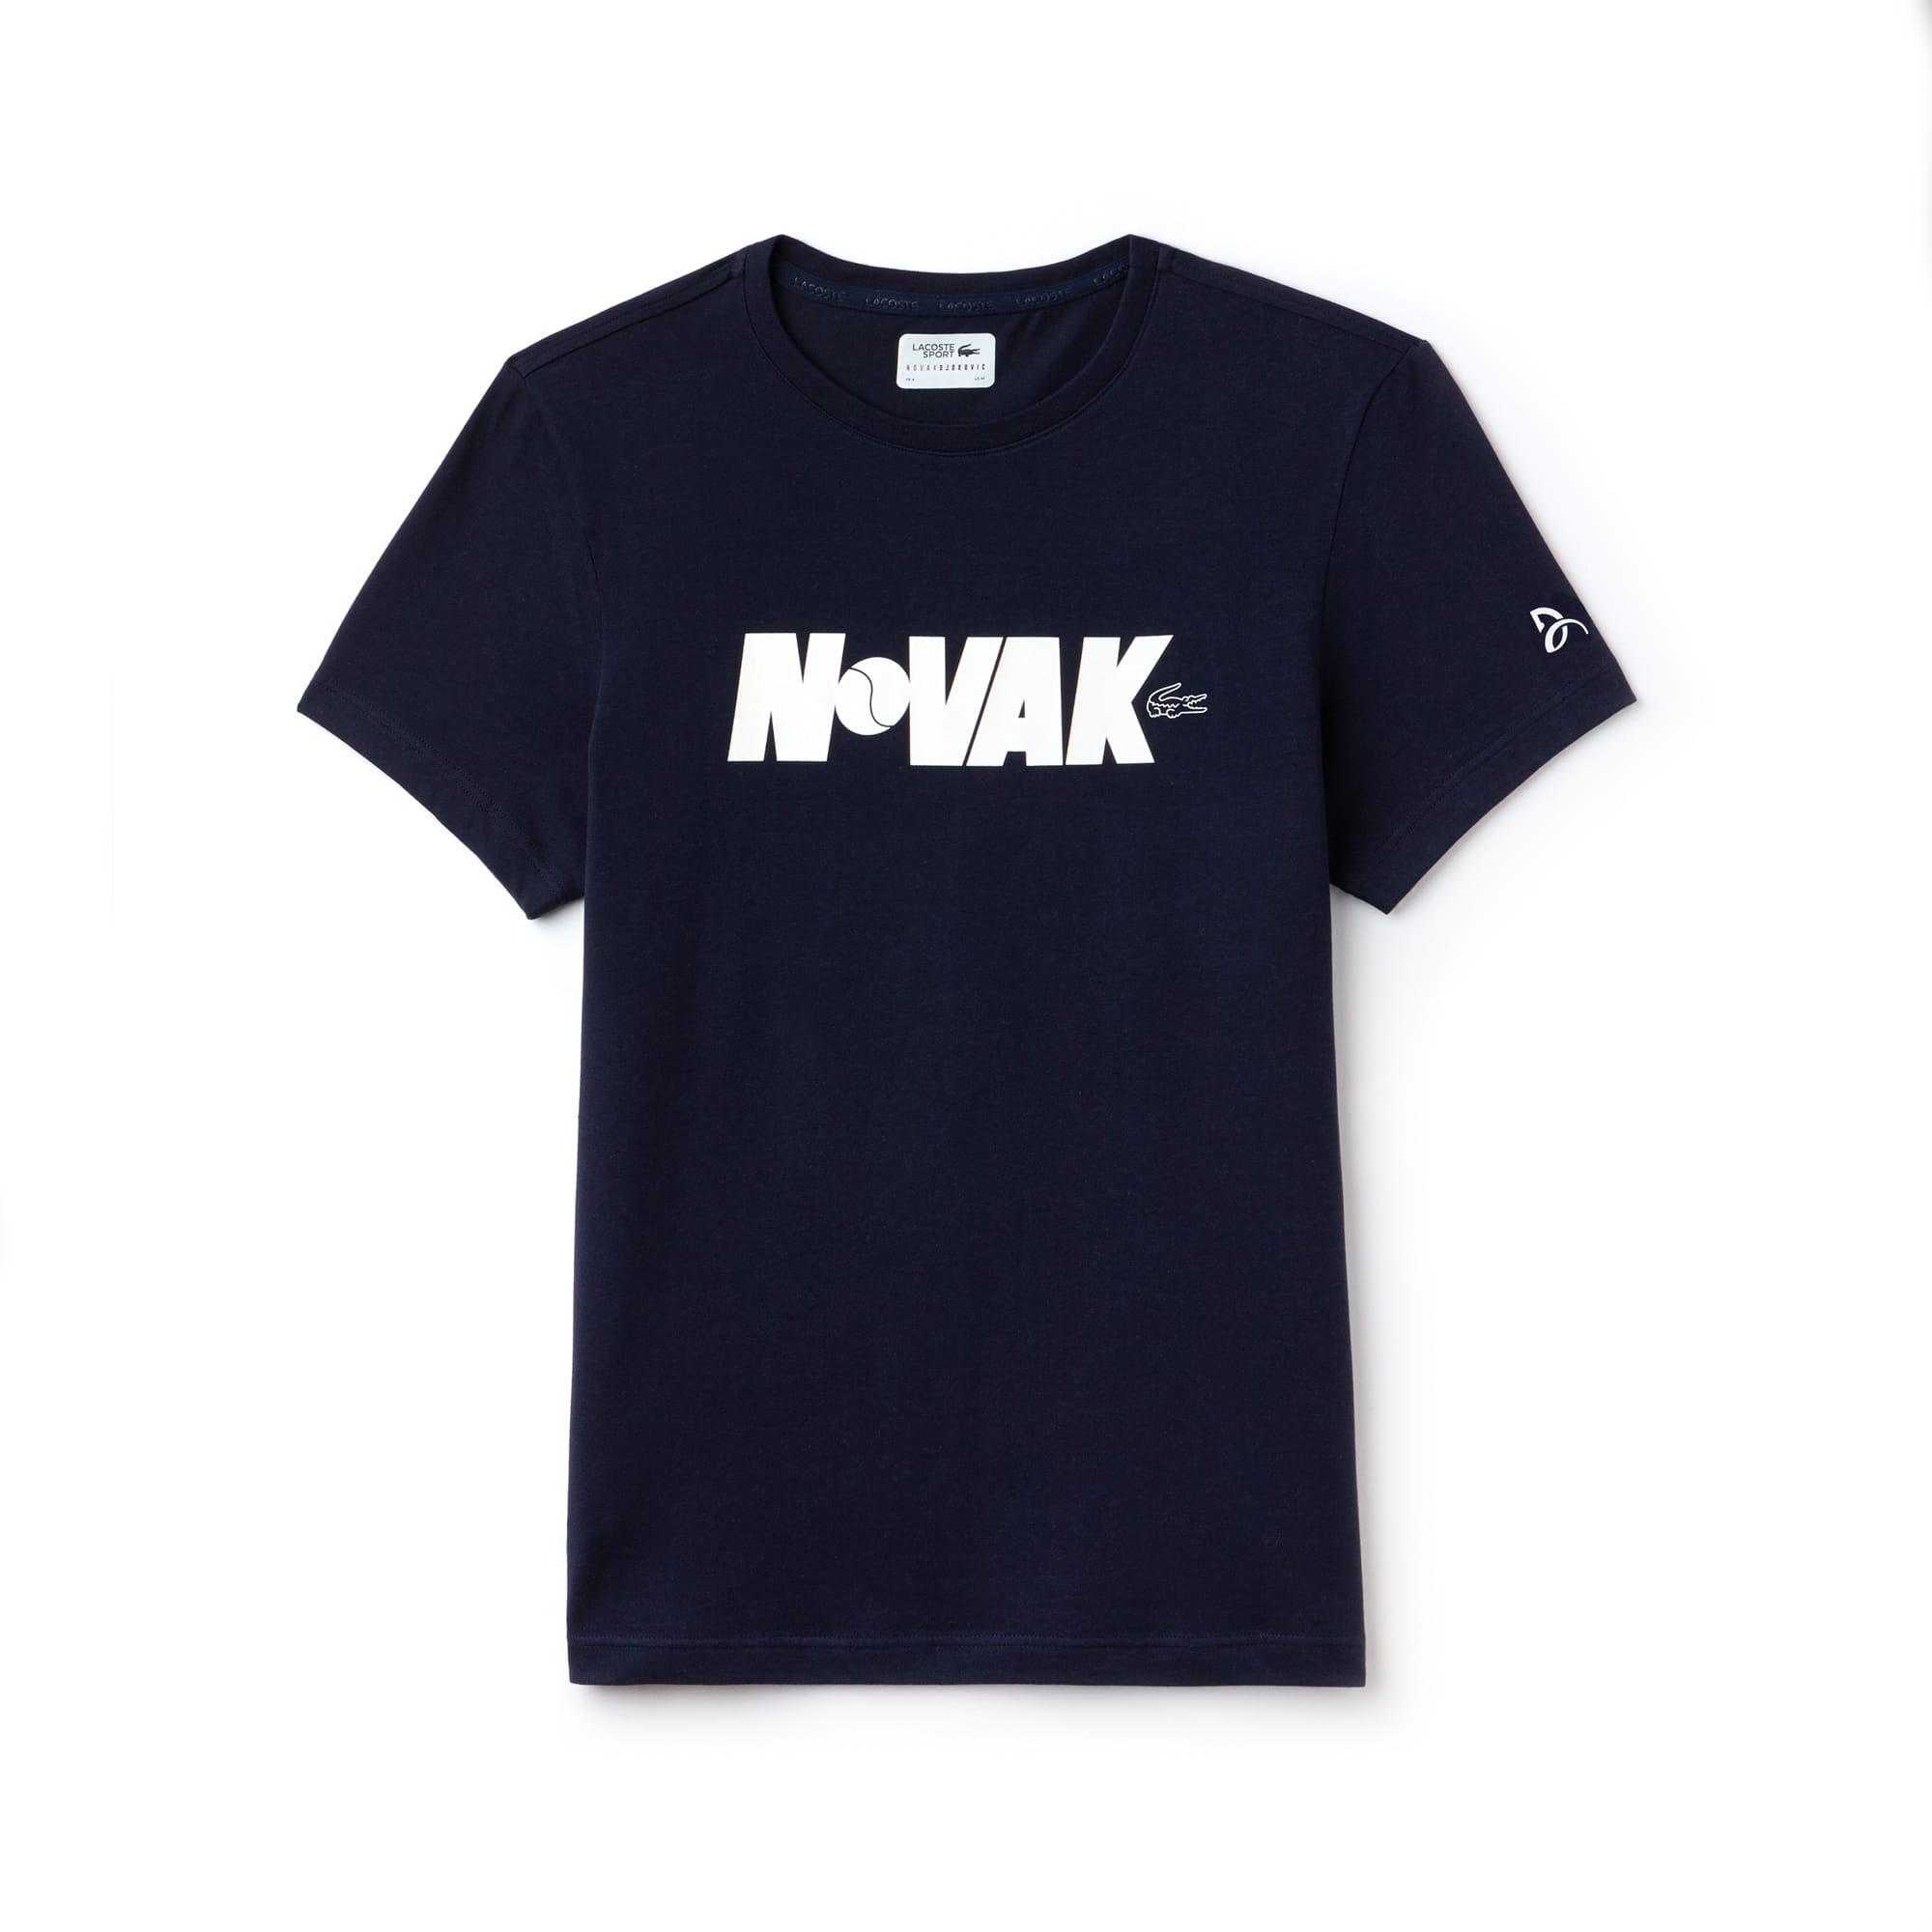 T-shirt girocollo Lacoste SPORT COLLEZIONE NOVAK DJOKOVIC SUPPORT WITH STYLE in jersey tecnico